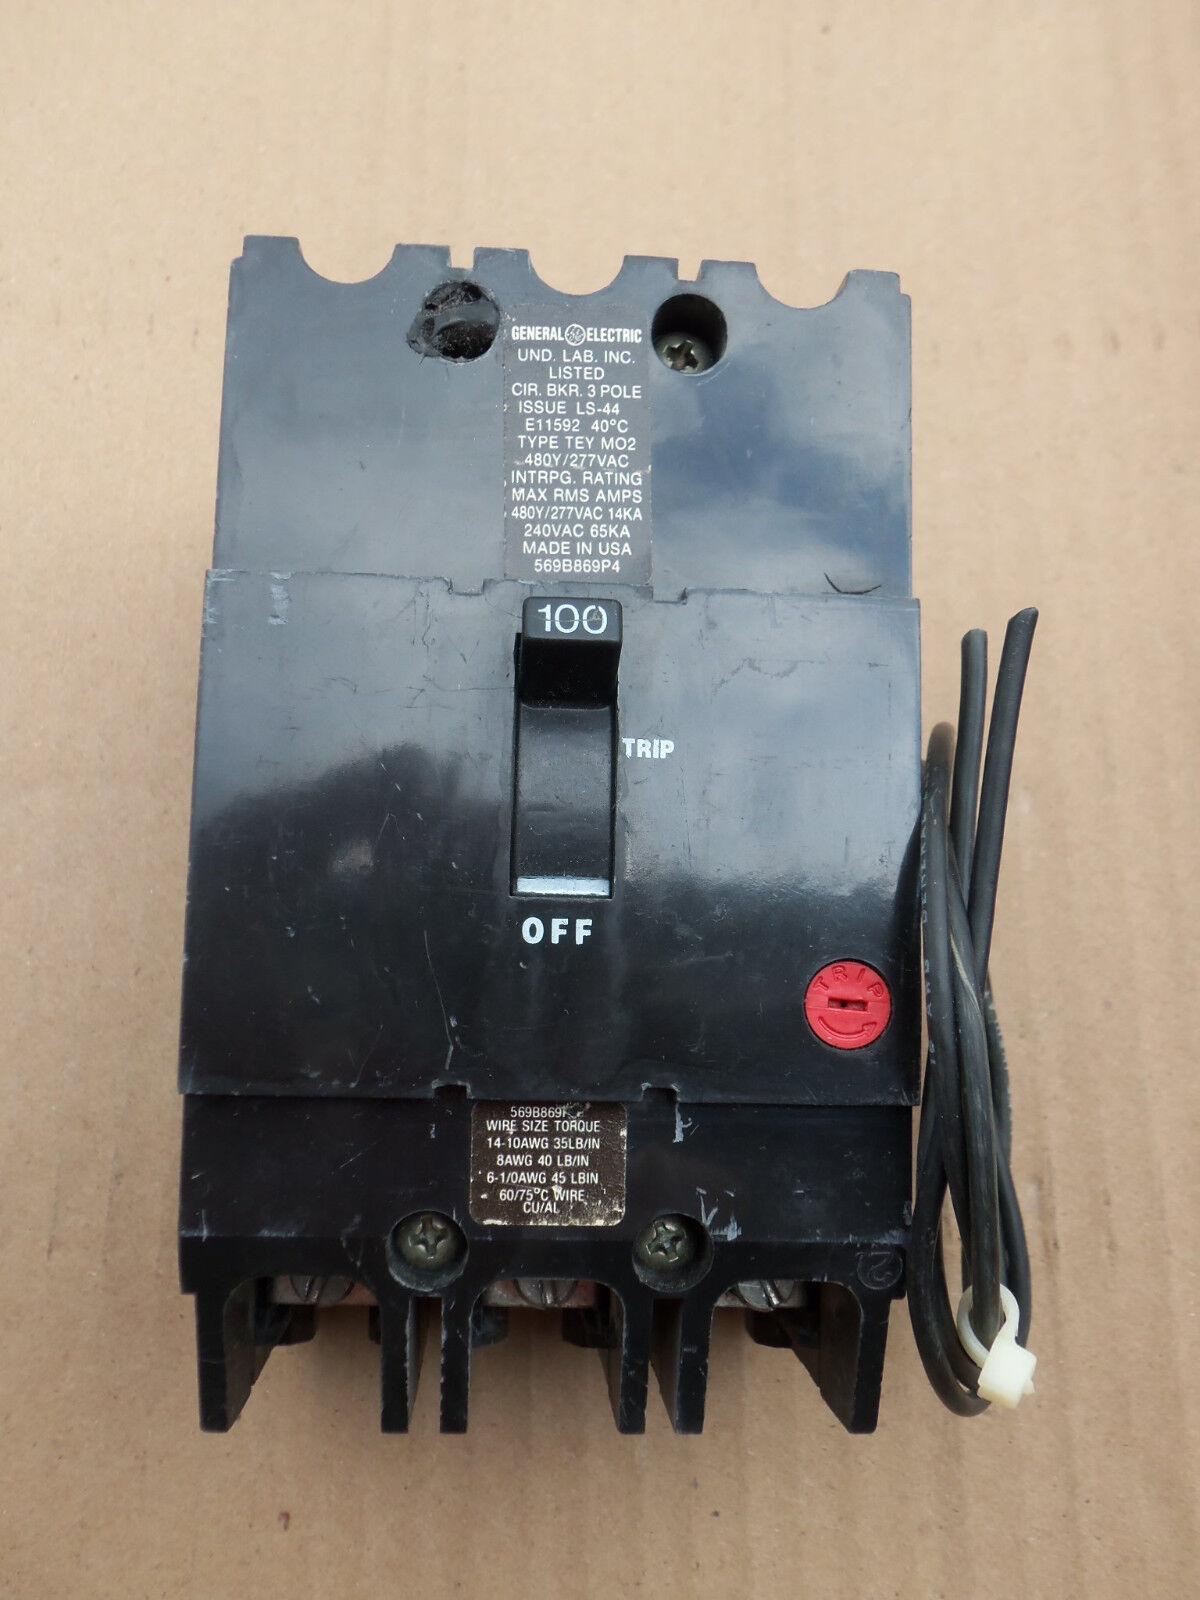 TEY3100ST12 General Electric Circuit Breaker 100a 480v | eBay